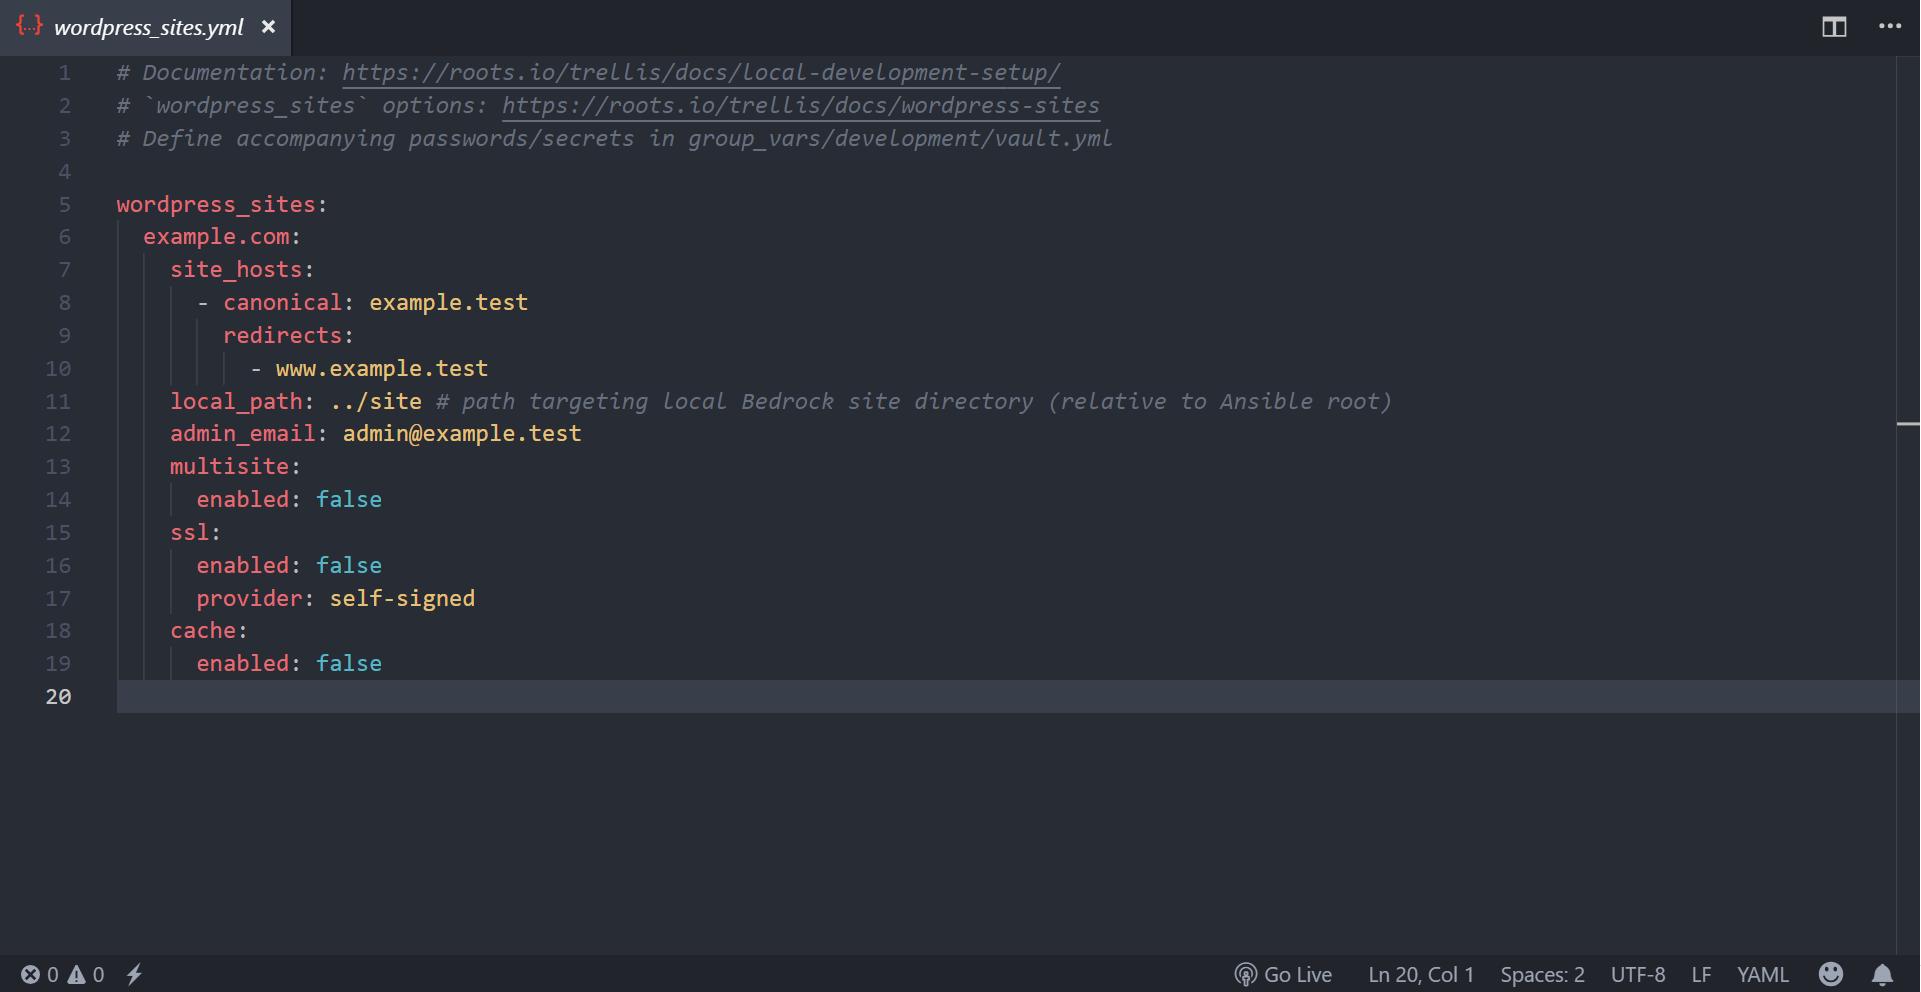 A screenshot of the wordpress_sites.yml file